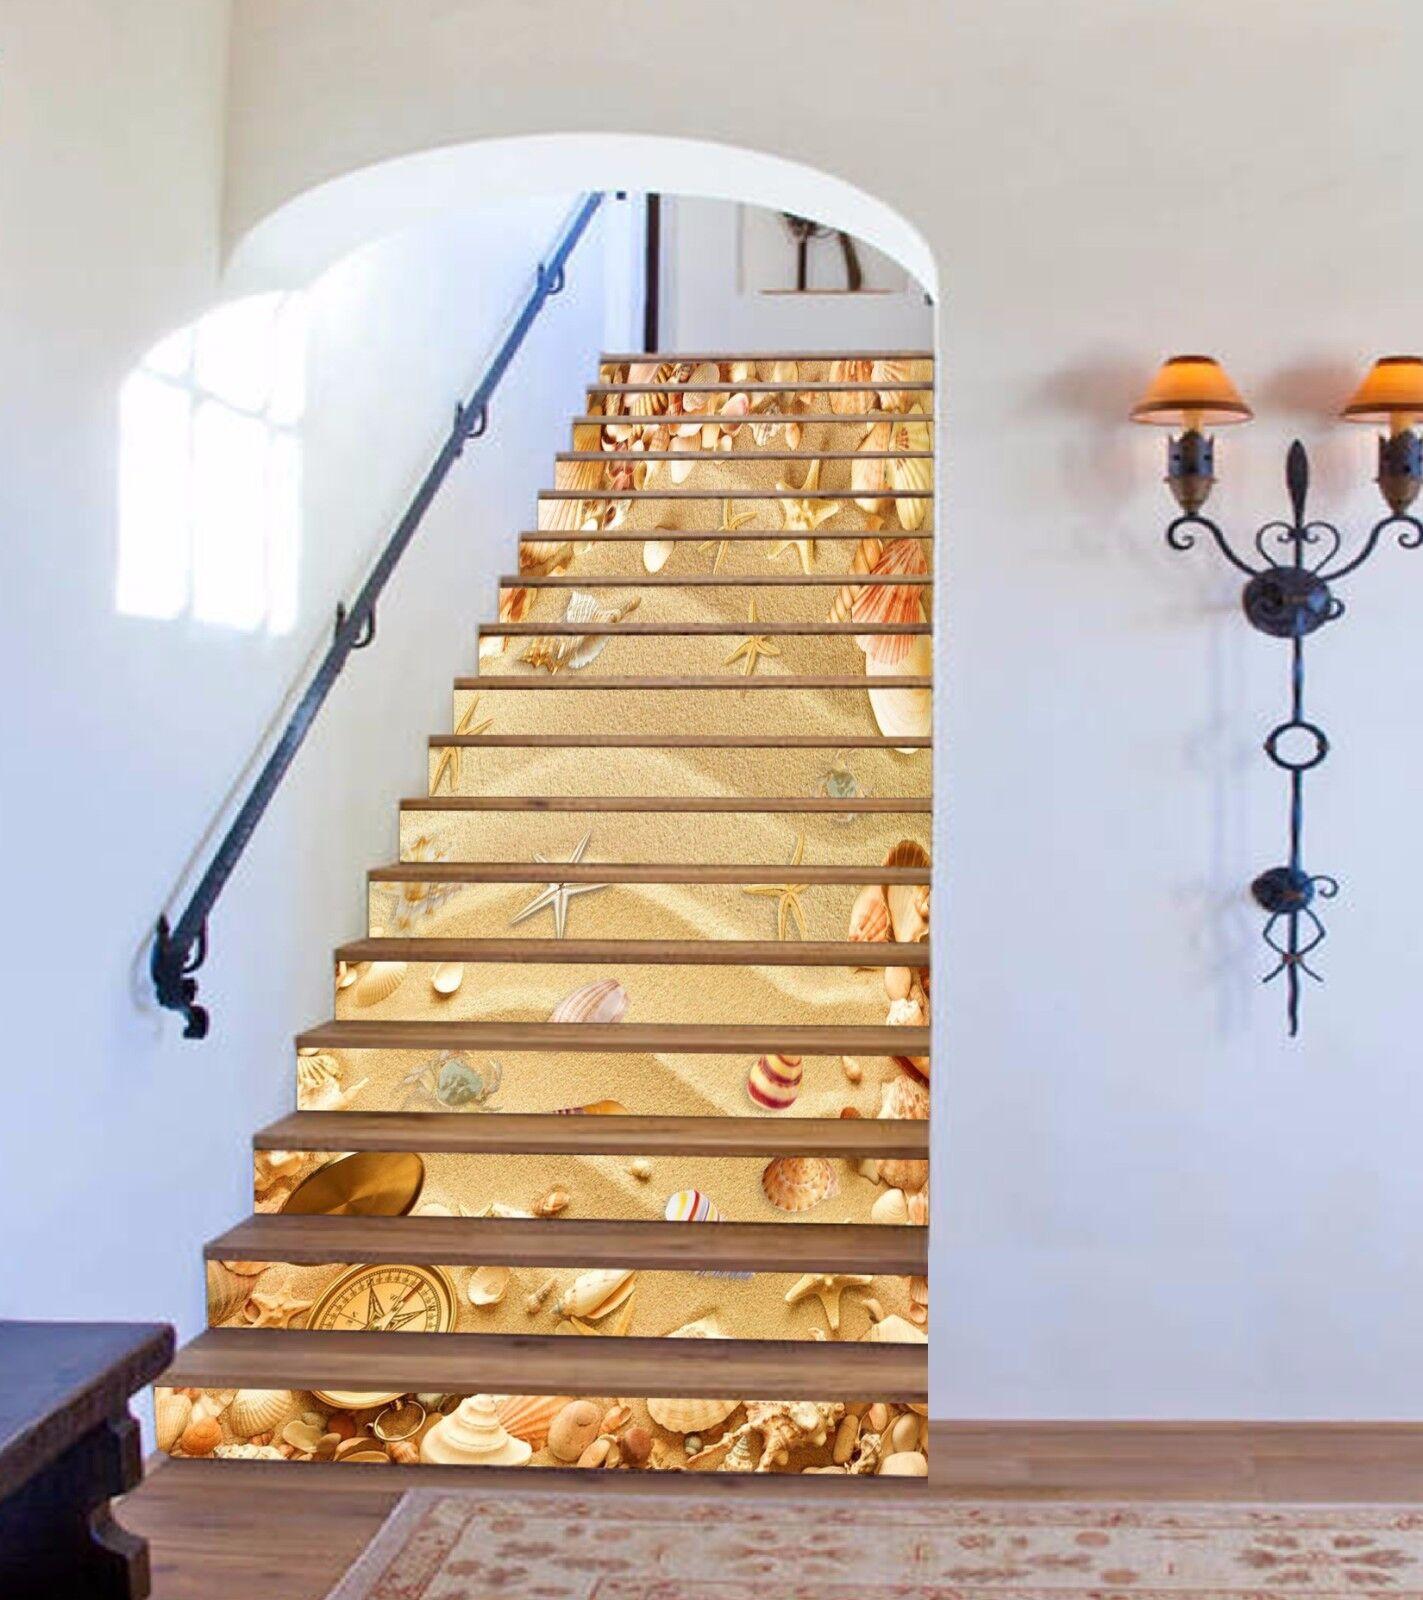 3D Sand Schale 769 Stair Risers Dekoration Fototapete Vinyl Aufkleber Tapete DE